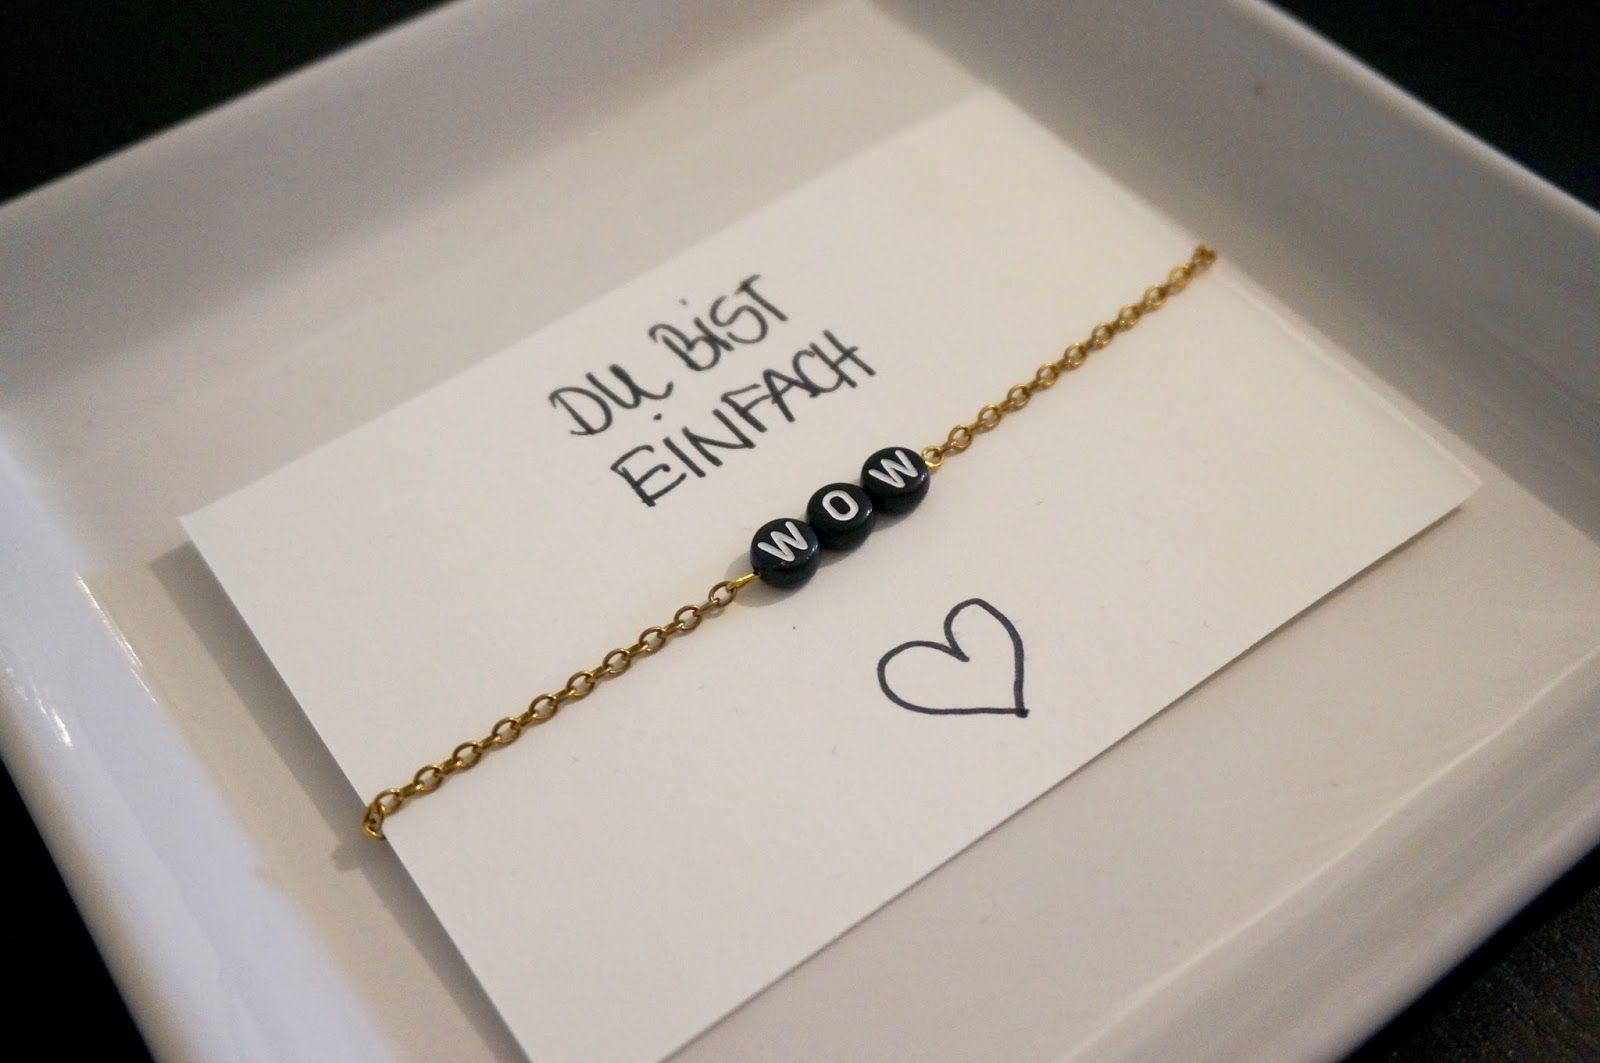 DIY Armband Weihnachtsgeschenk | Kreativ | Pinterest ...